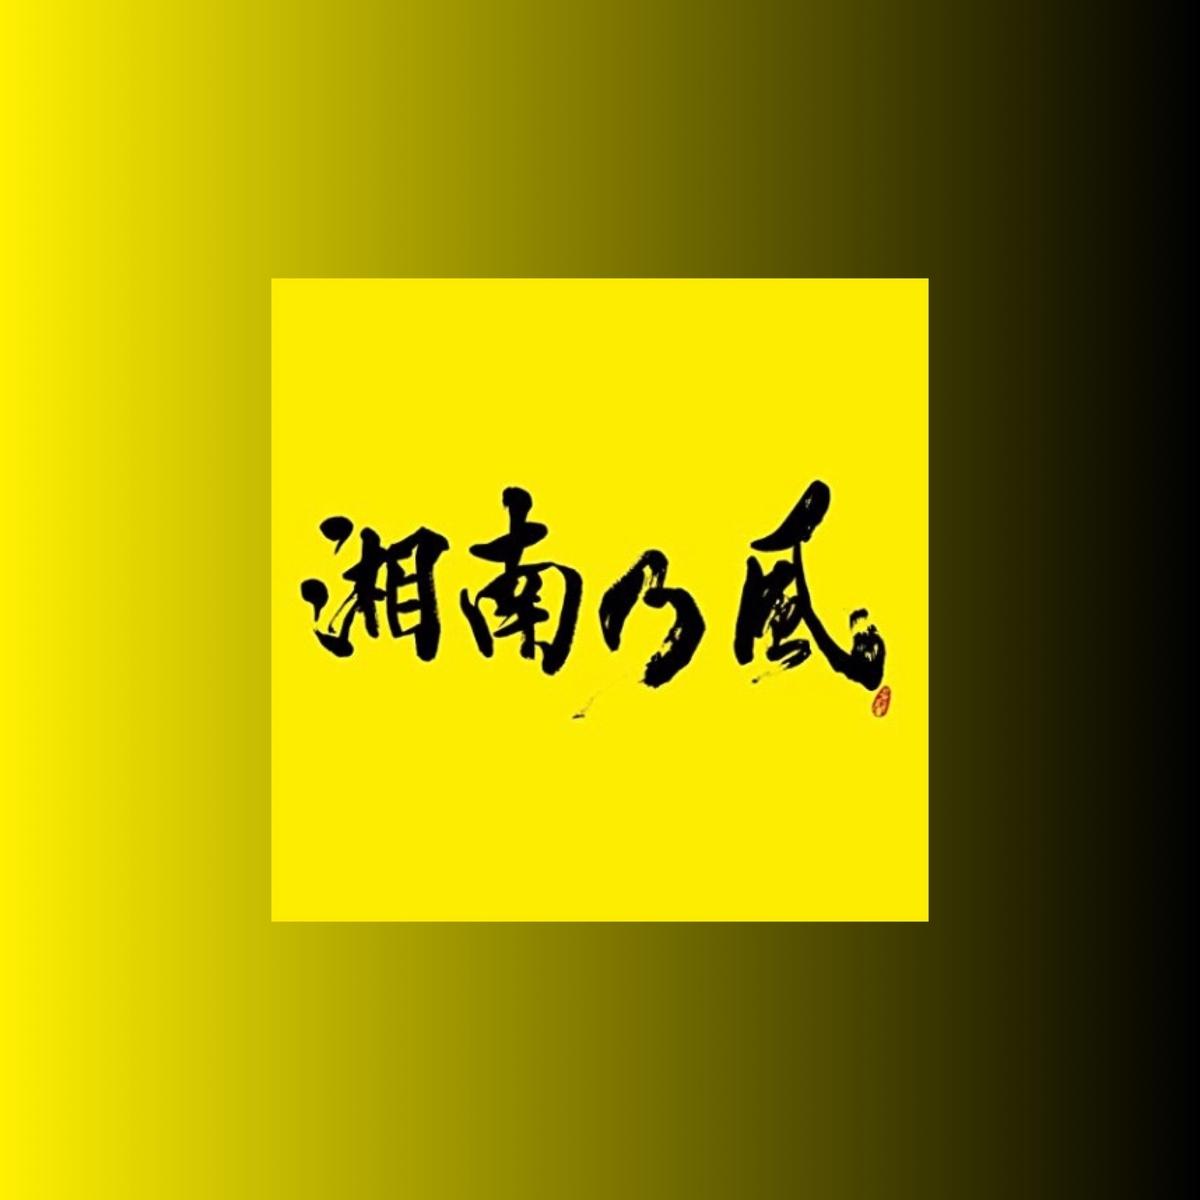 f:id:nantokadekiru:20190616220524j:plain